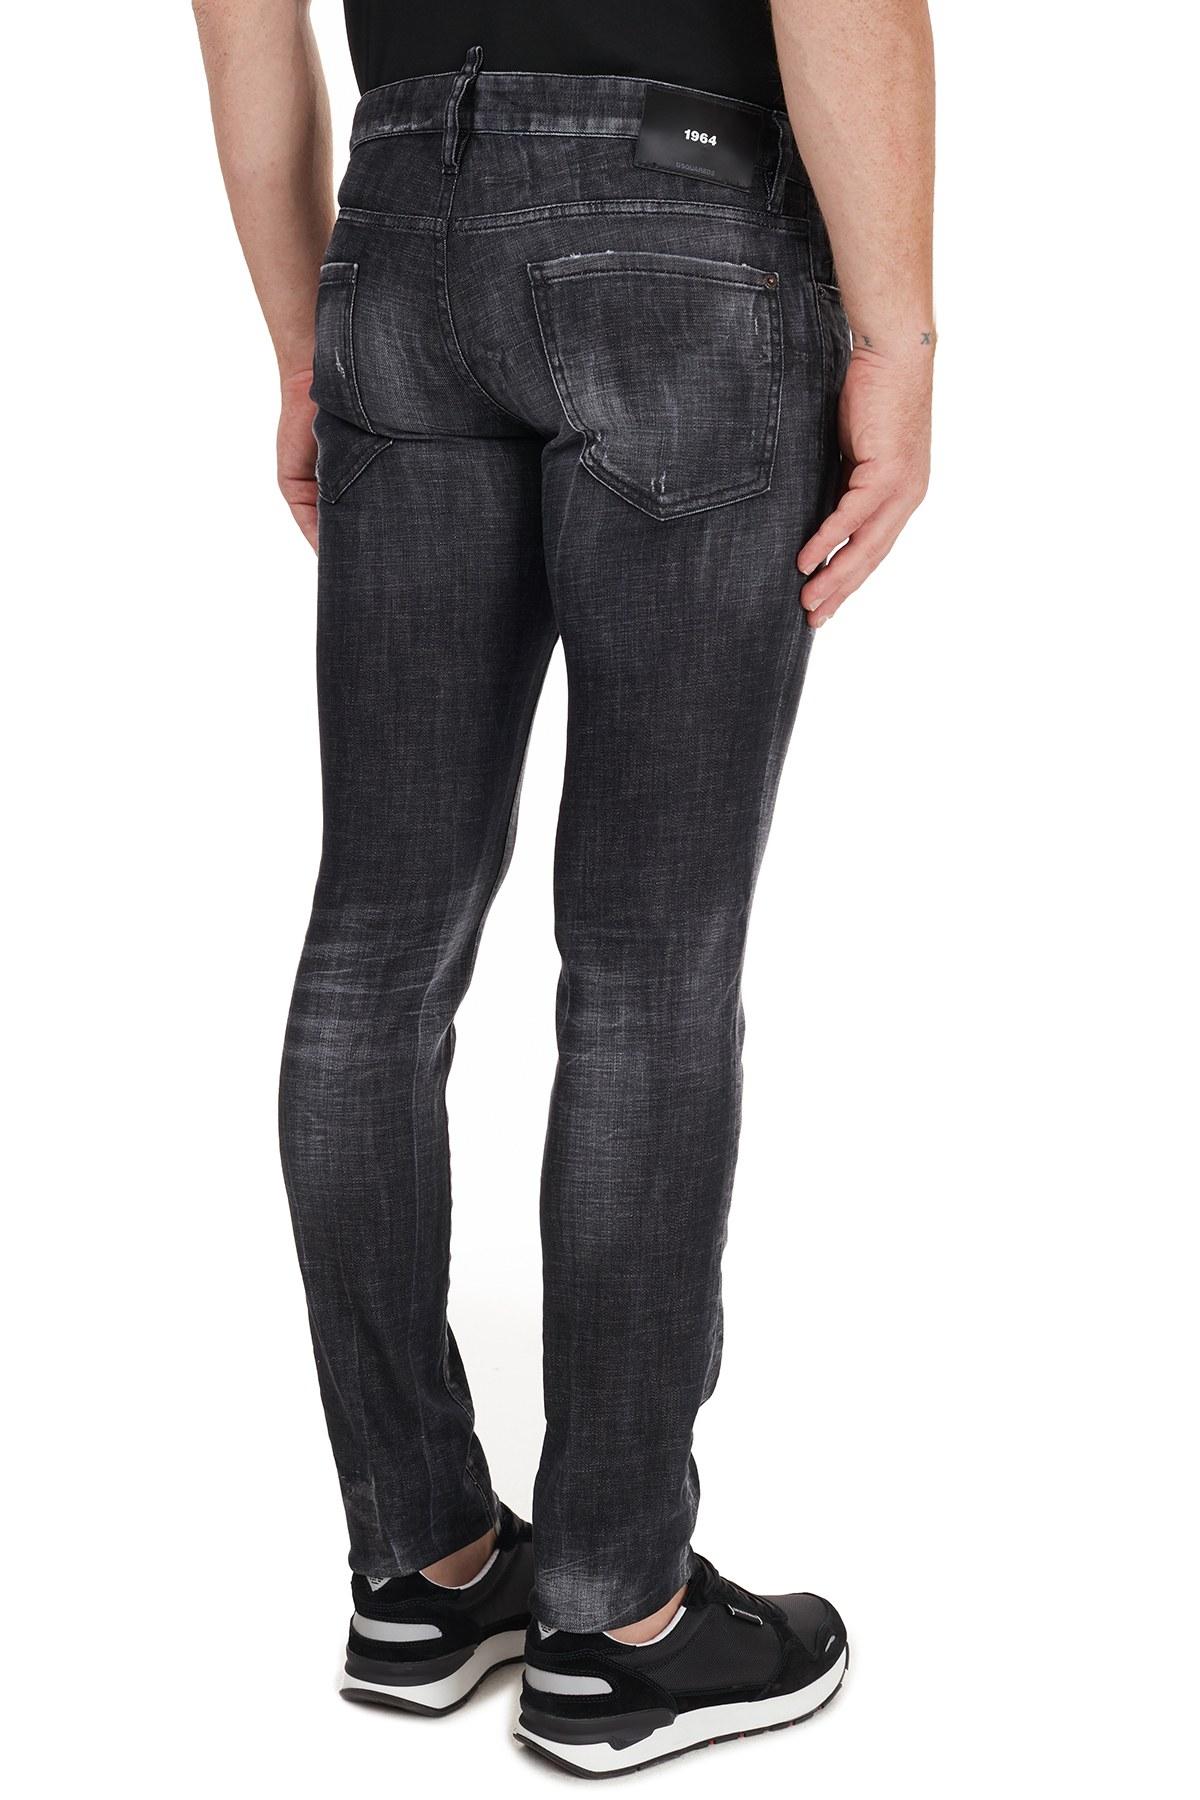 Dsquared2 Jeans Erkek Kot Pantolon S74LB0784 S30357 900 SİYAH